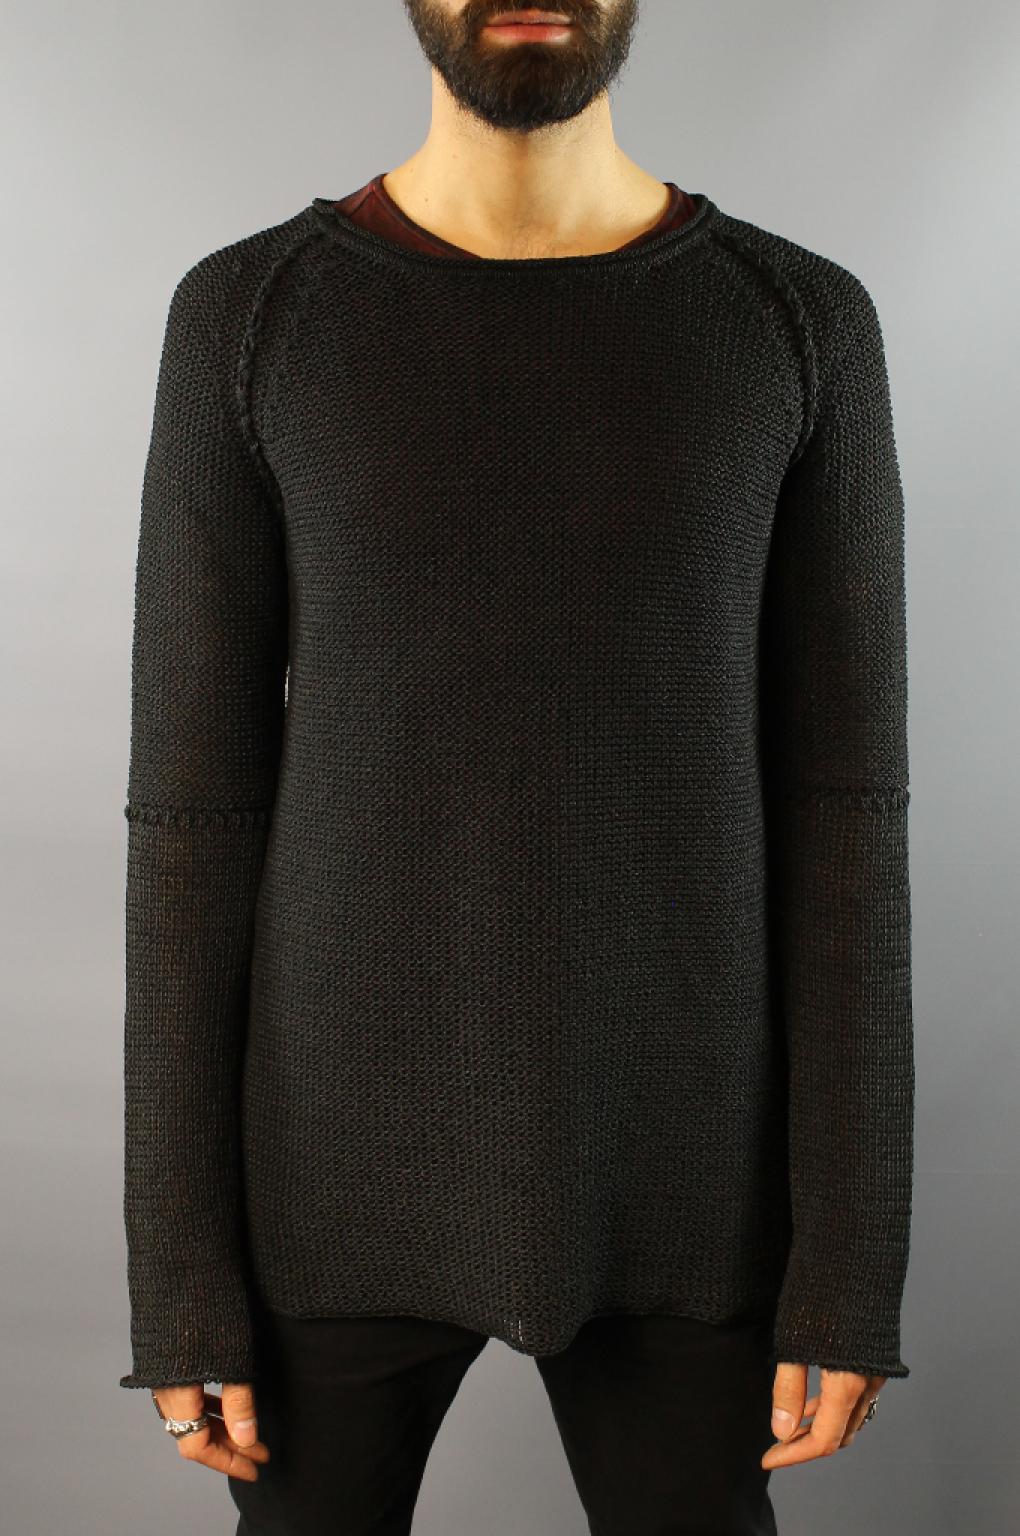 Lumen Sweater Cotton Linen My Style Umbra Et Pinterest 2 rxqRTr